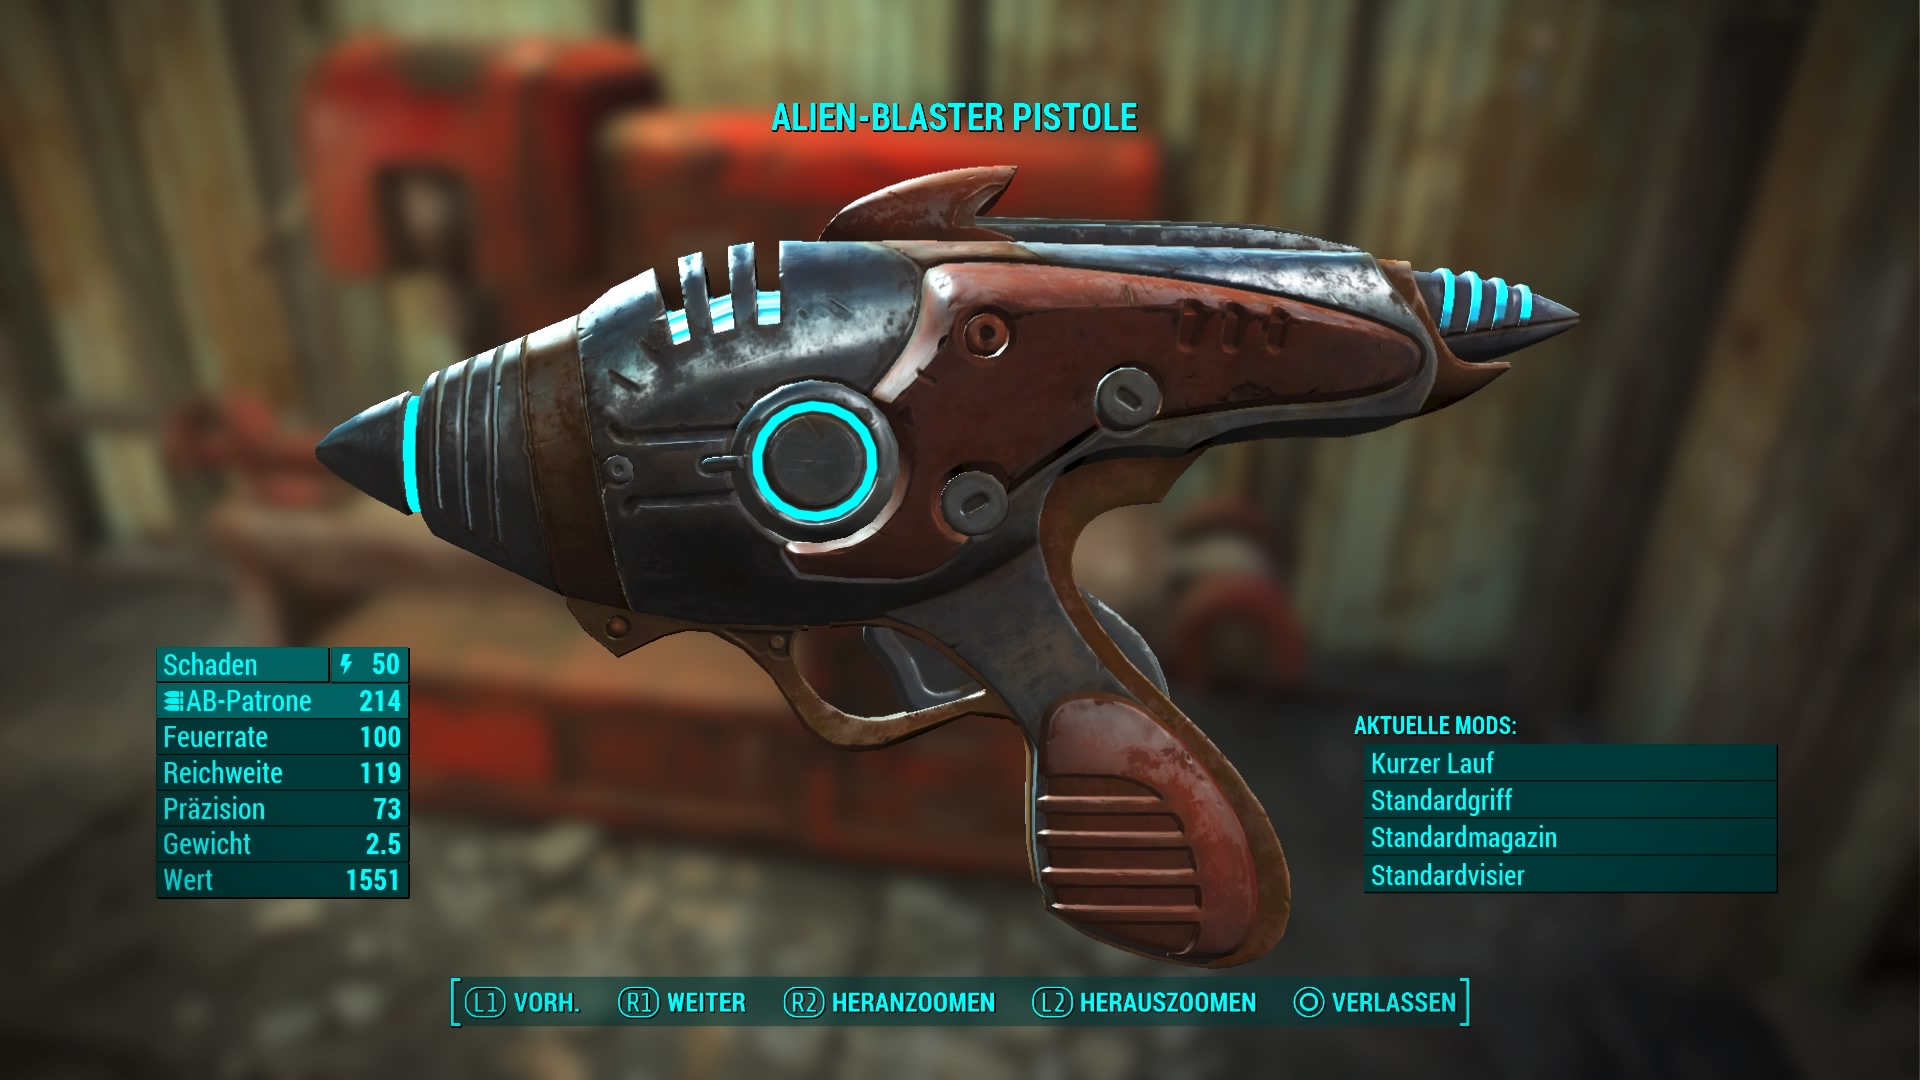 Fallout 4 Wackelpuppen Karte.Fallout 4 Alien Blaster Pistole Fundort Der Einzigartigen